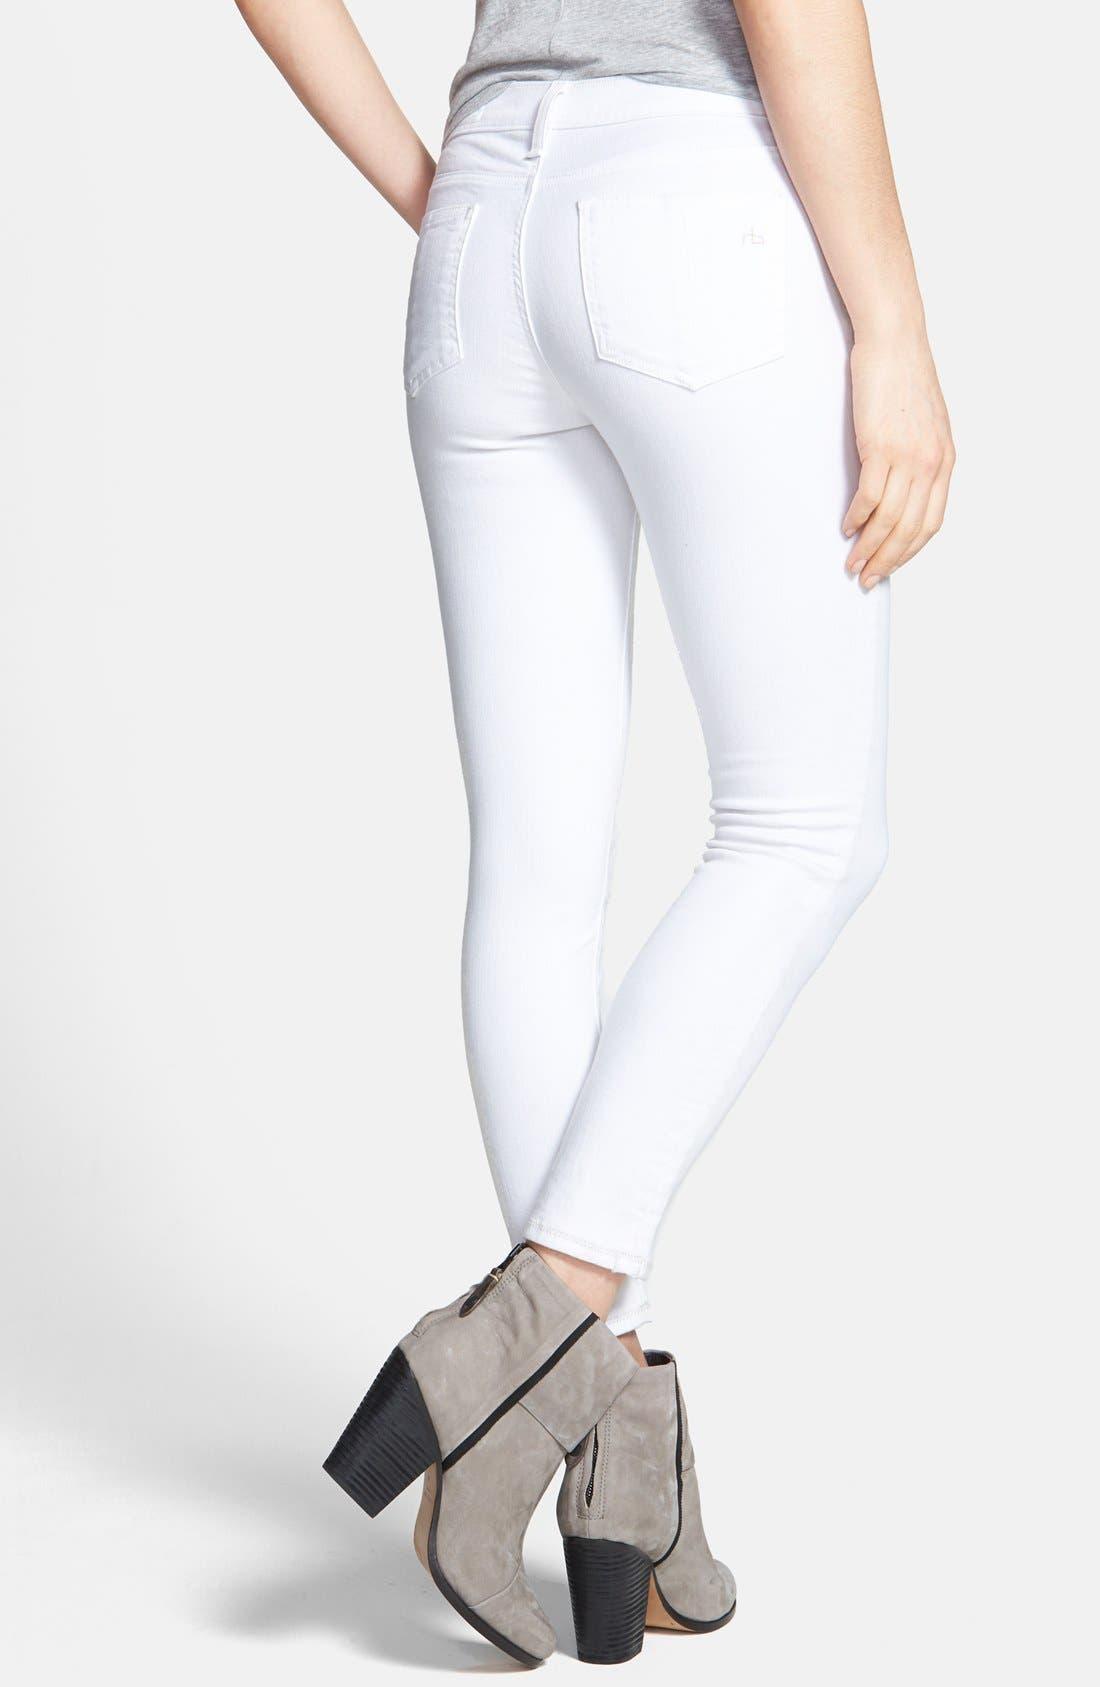 Alternate Image 2  - rag & bone/JEAN 'The Skinny' Crop Jeans (Bright White)